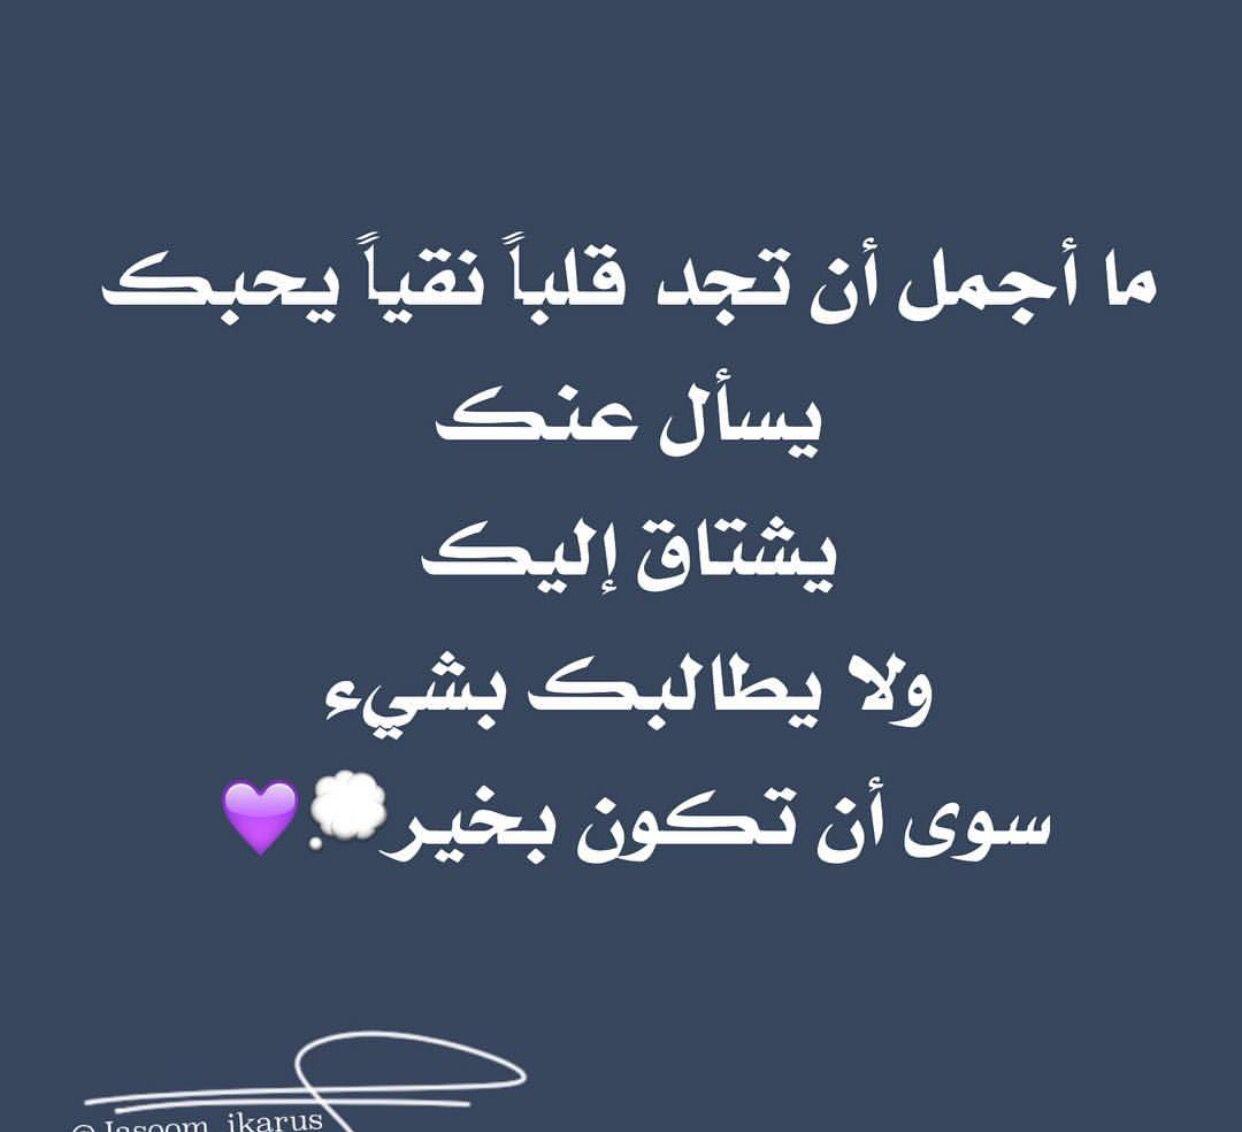 القلوب النقيه نادره Arabic Calligraphy Calligraphy